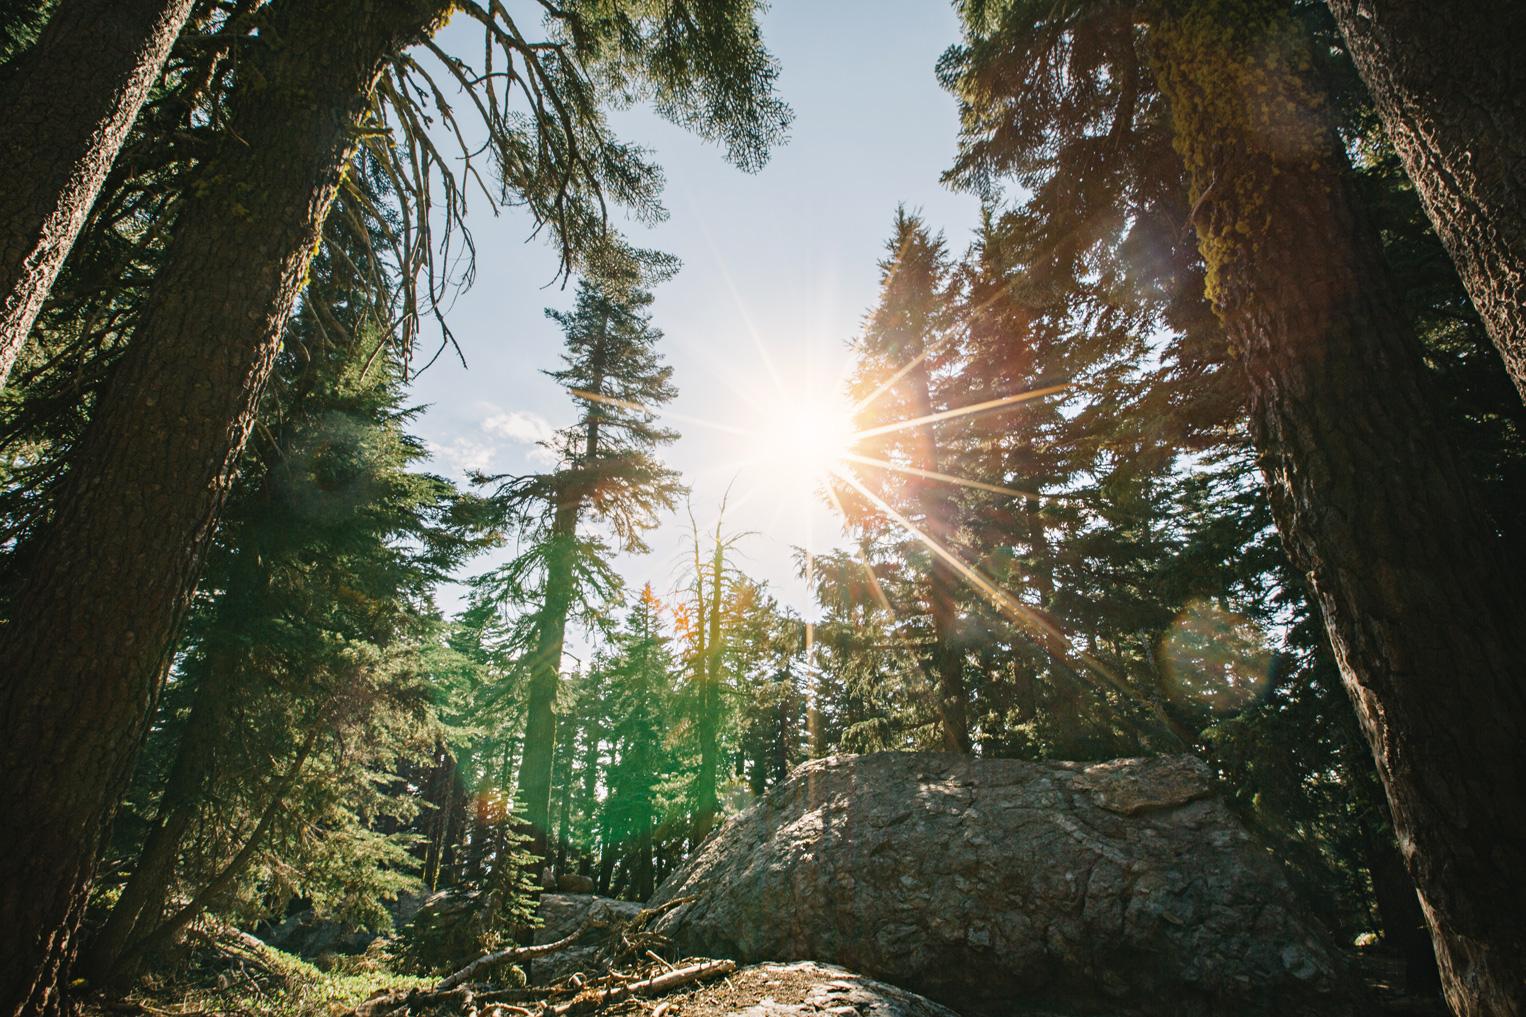 CindyGiovagnoli_outdoors_photographer_Sierra_Buttes_firetower_watchtower_Sardine_Snag_Bear_lake_hike_swim_camp-041.jpg